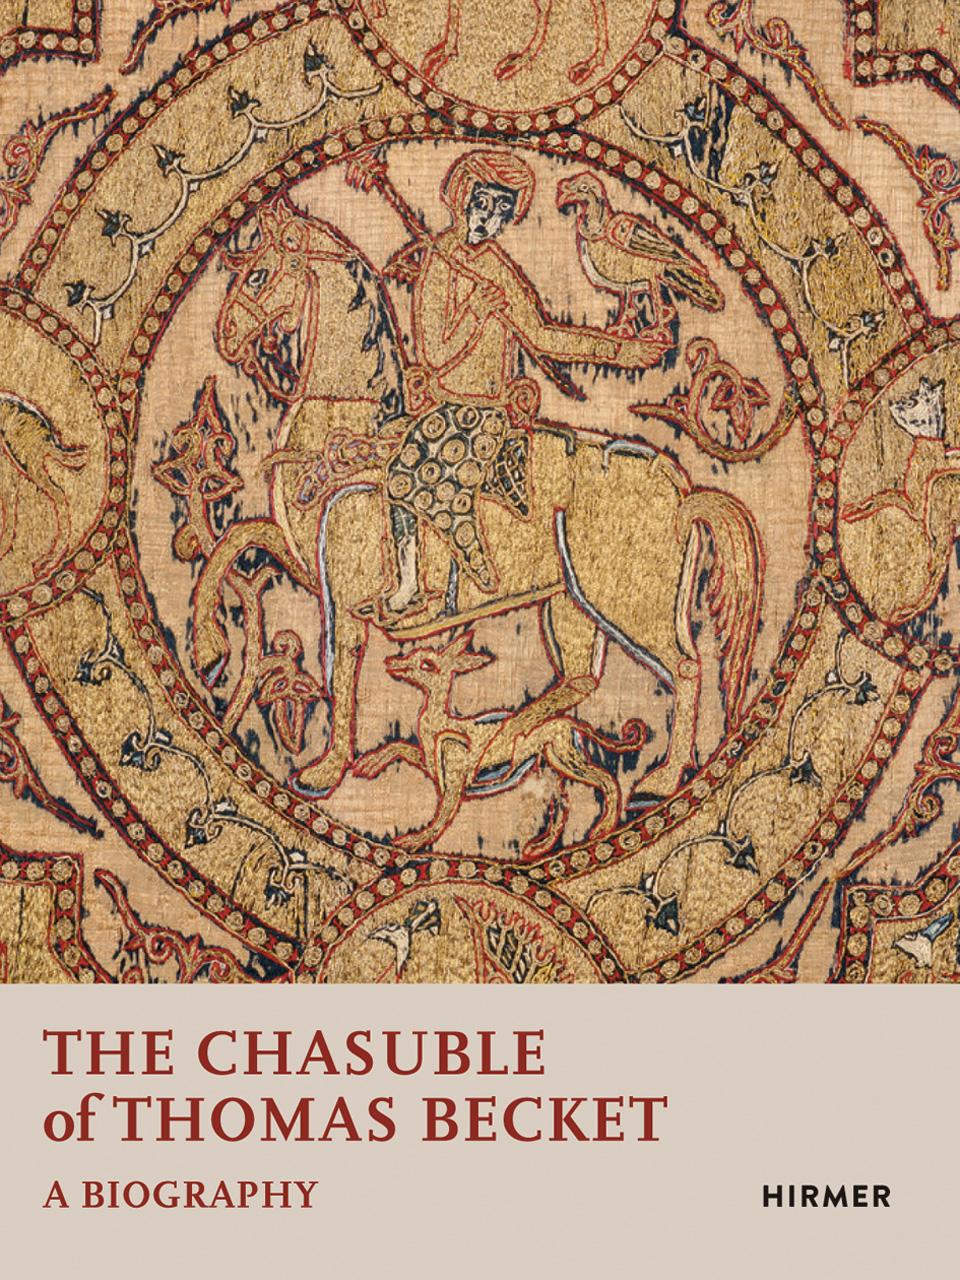 Chasuble of Thomas Becket